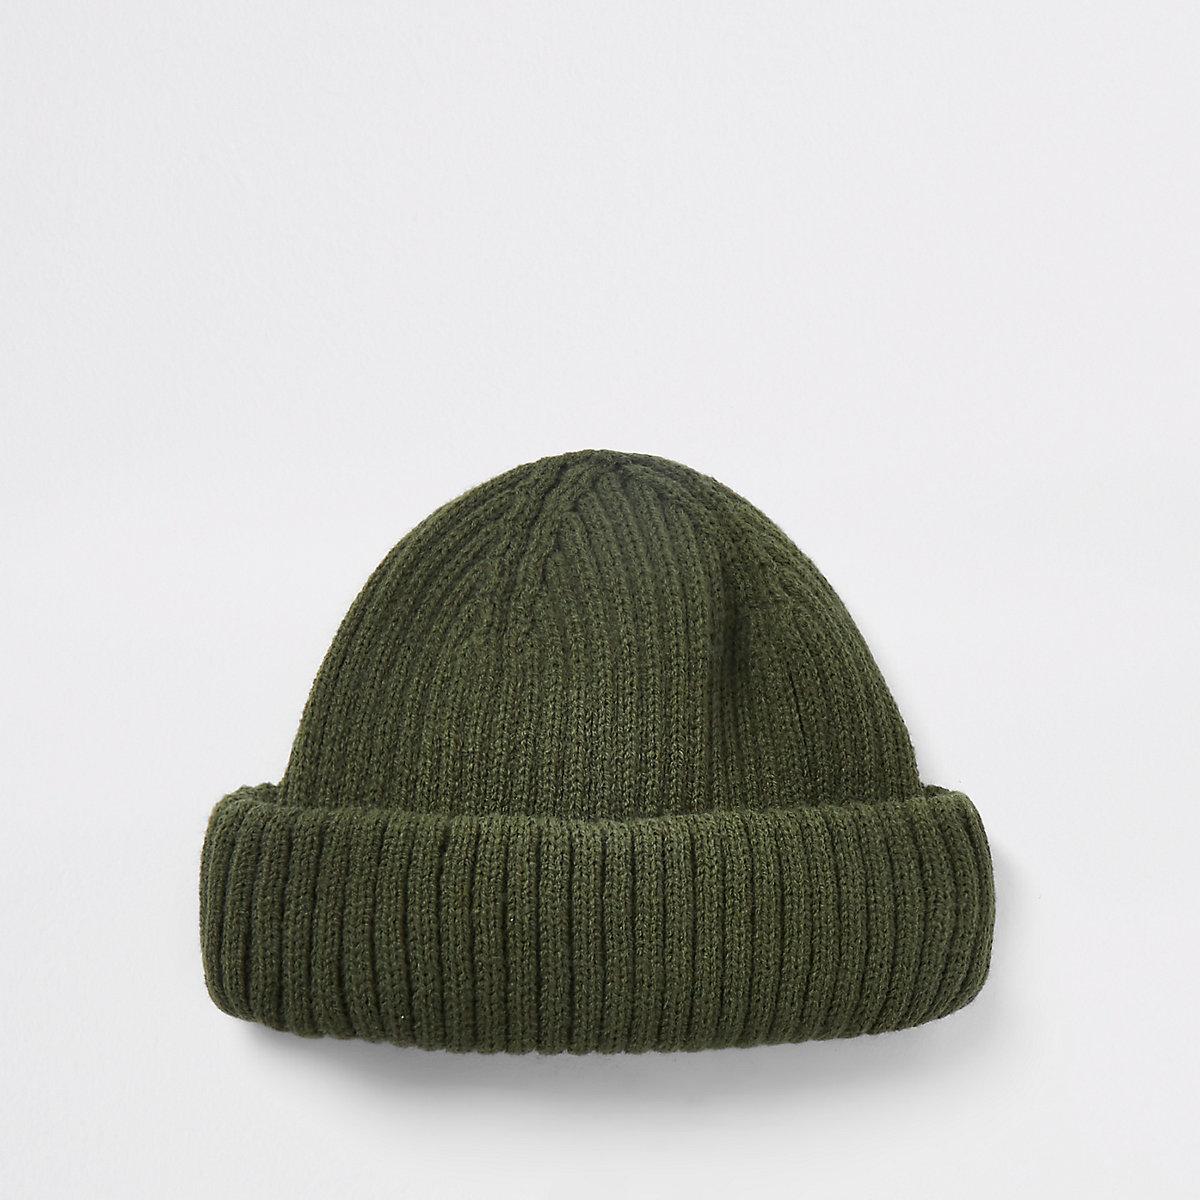 Khaki green mini fisherman beanie hat